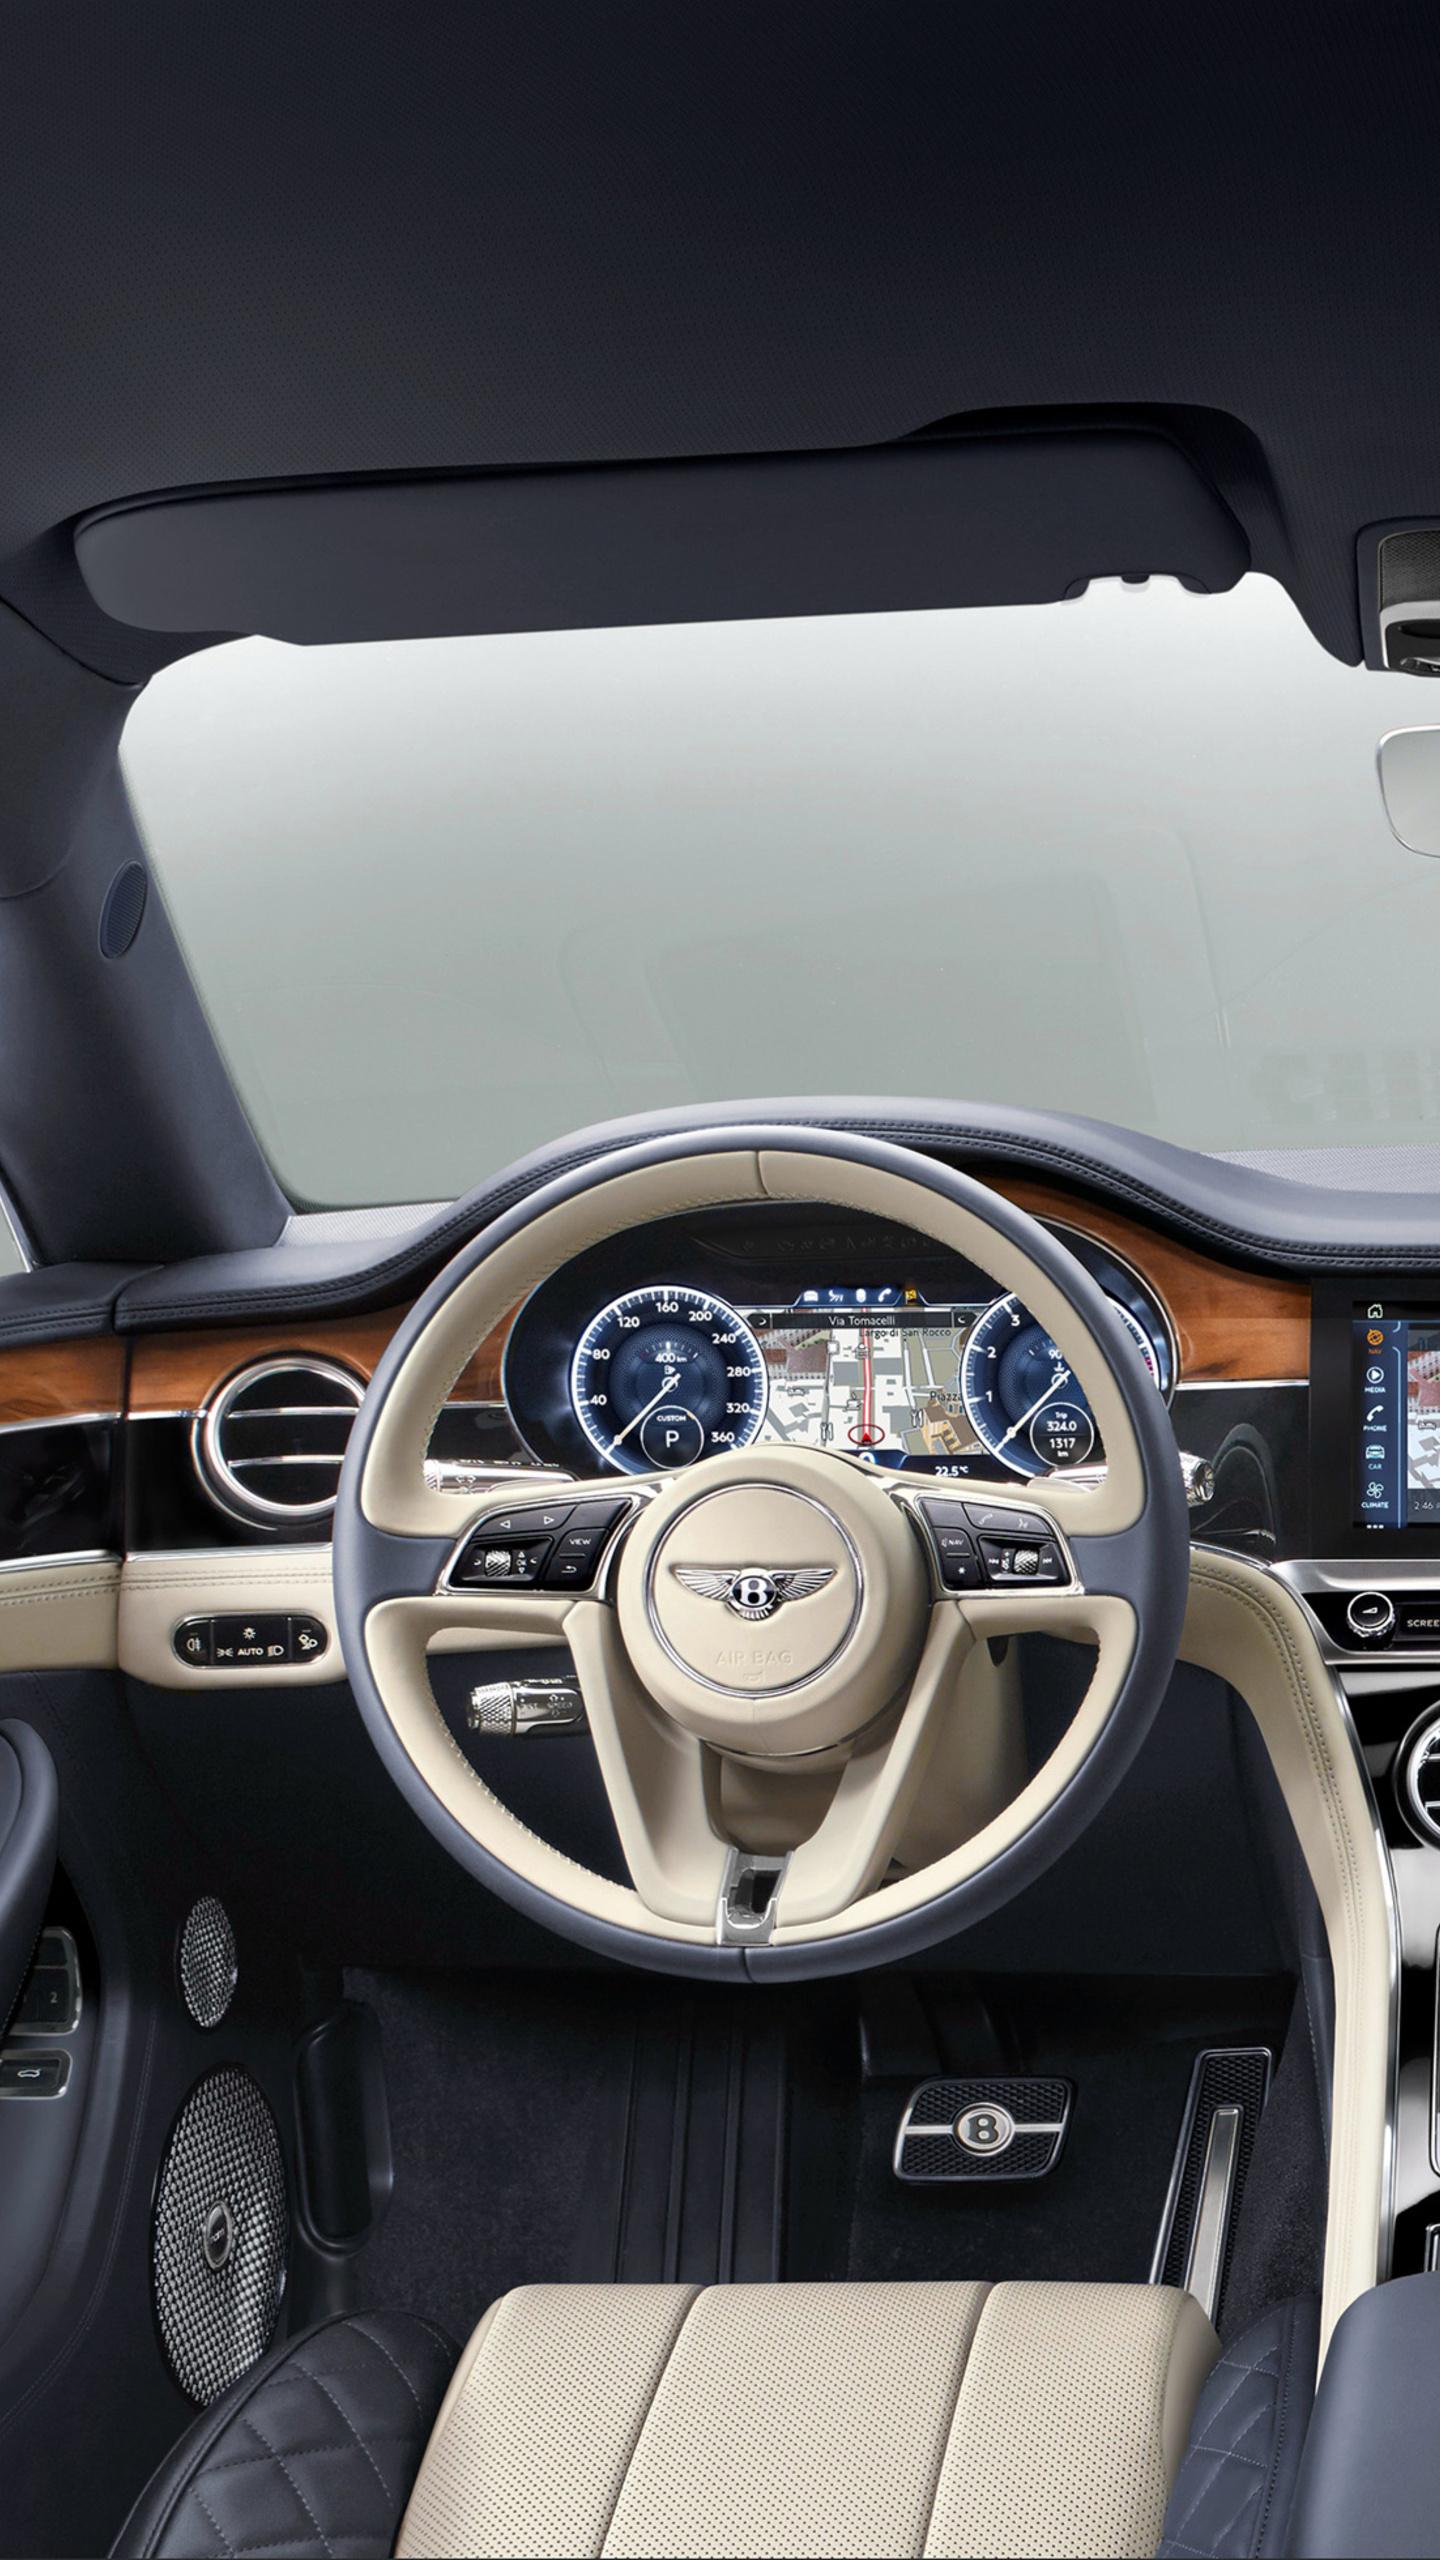 1440x2560 Bentley Continental Gt 2017 Interior Samsung Galaxy S6 S7 Google Pixel Xl Nexus 6 6p